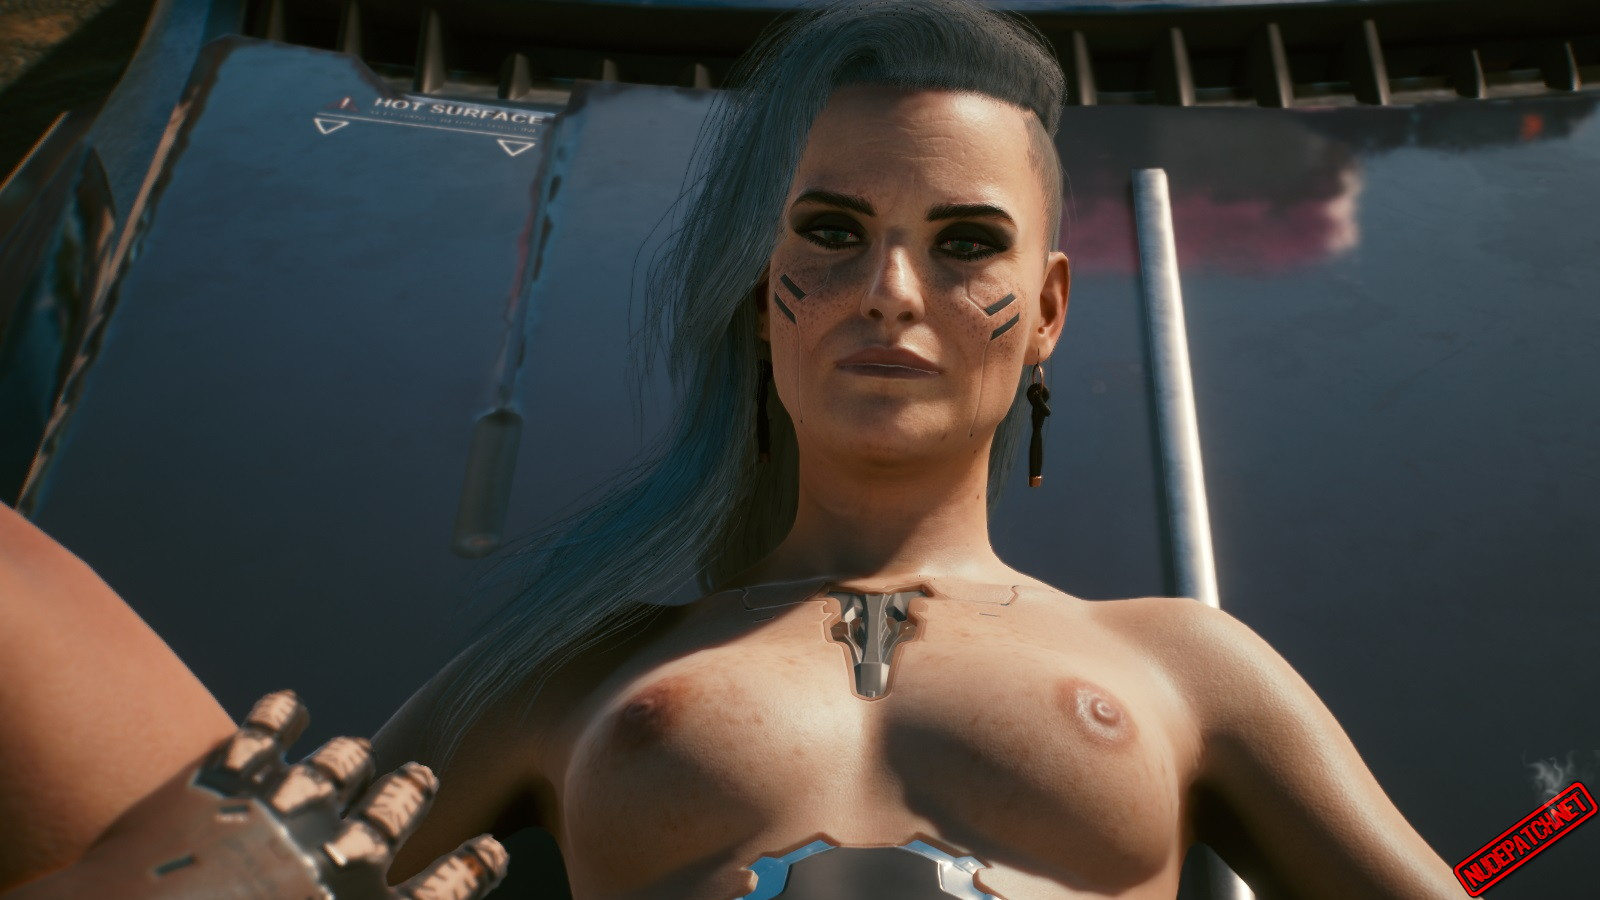 Cyberpunk 2077 Rogue Nude Mod